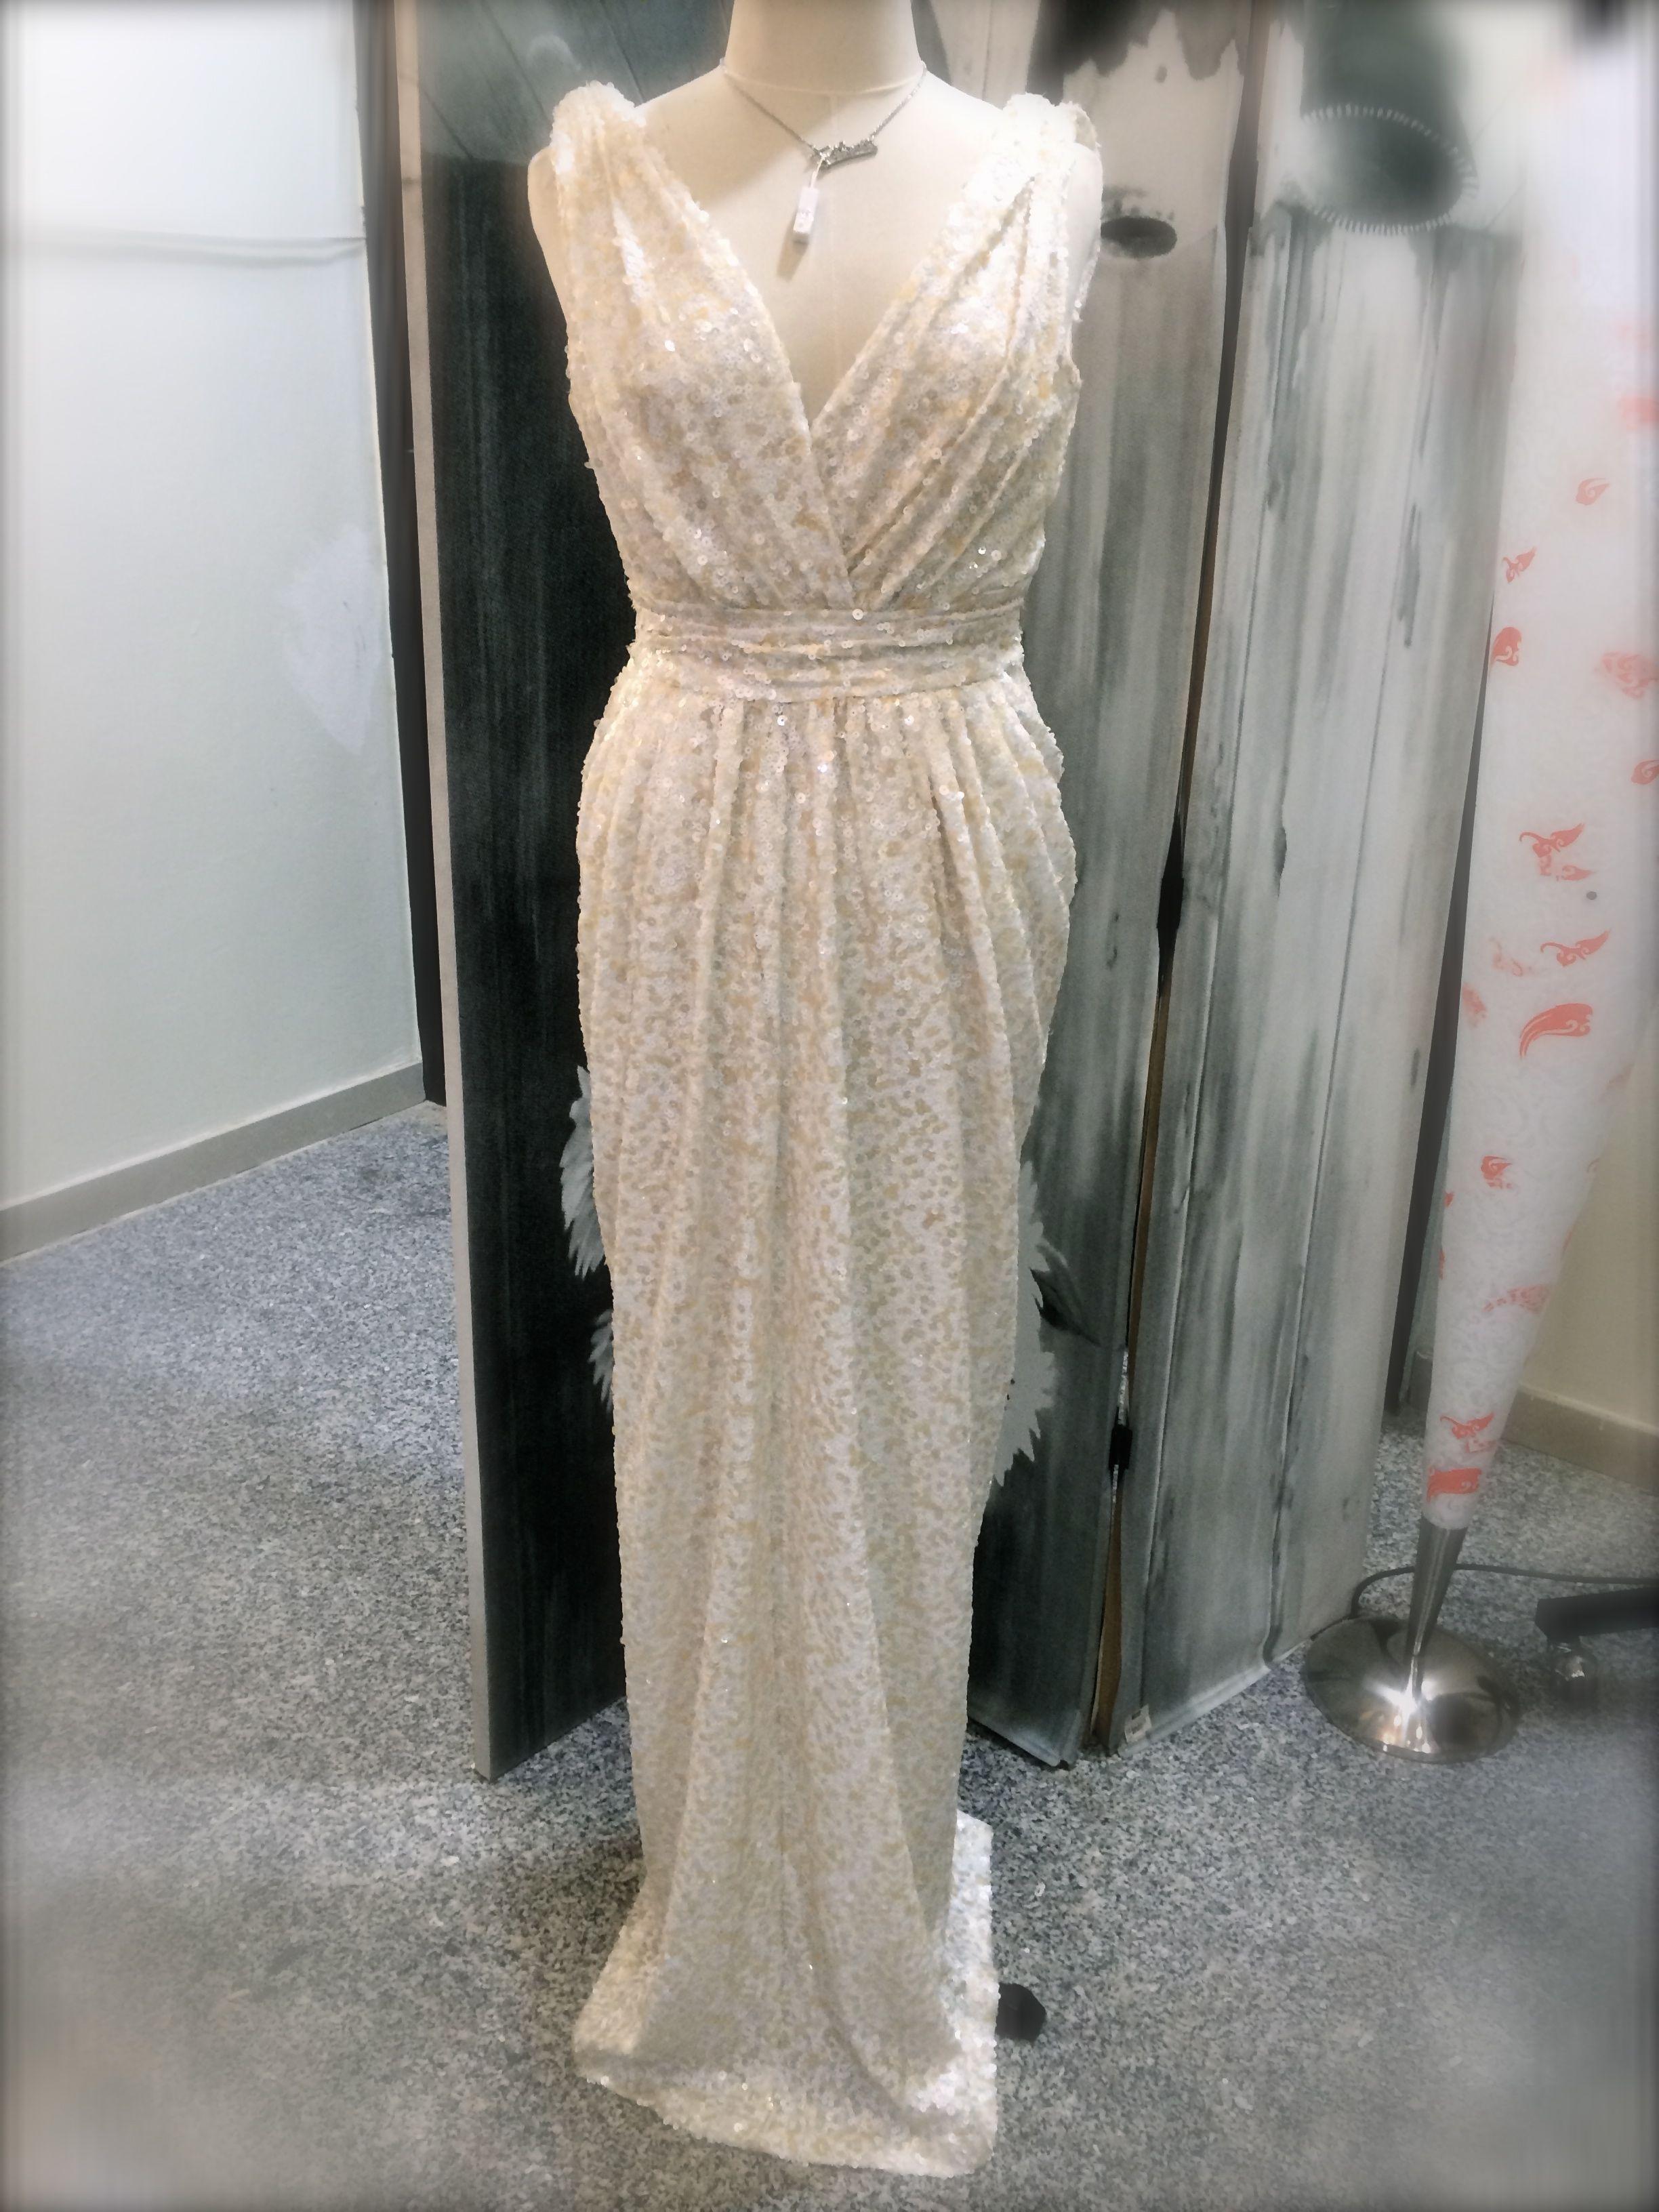 Used BHLDN Bette Gown Wedding Dress   Size: 4 $600   Wedding